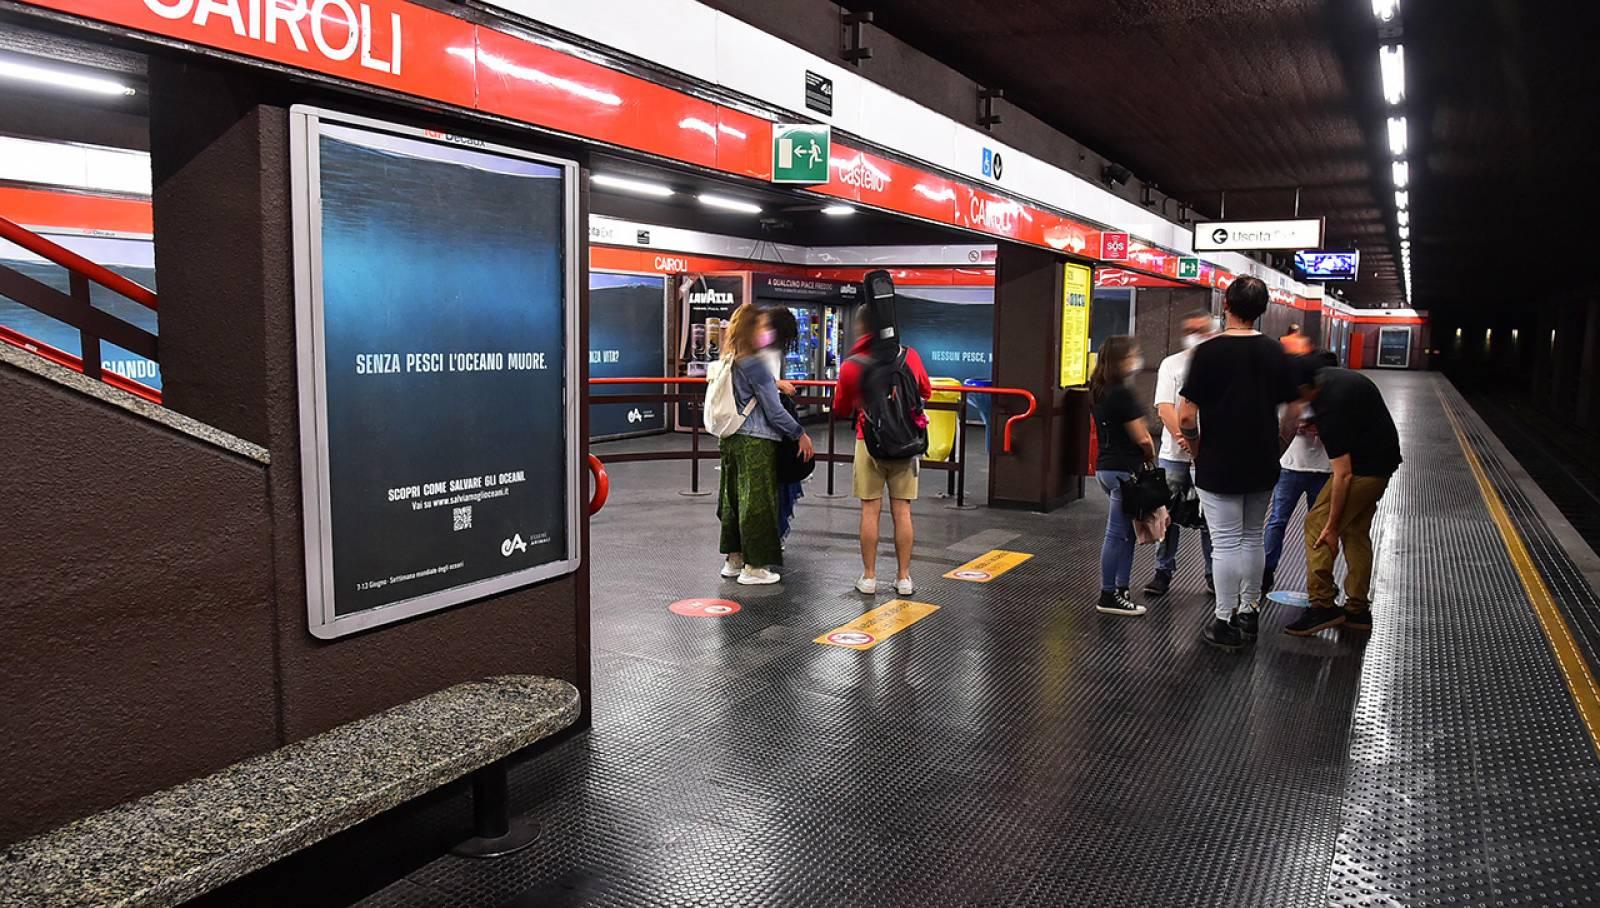 OOH IGPDecaux Milano pubblicità in metropolitana per  Associazione Essere Animali